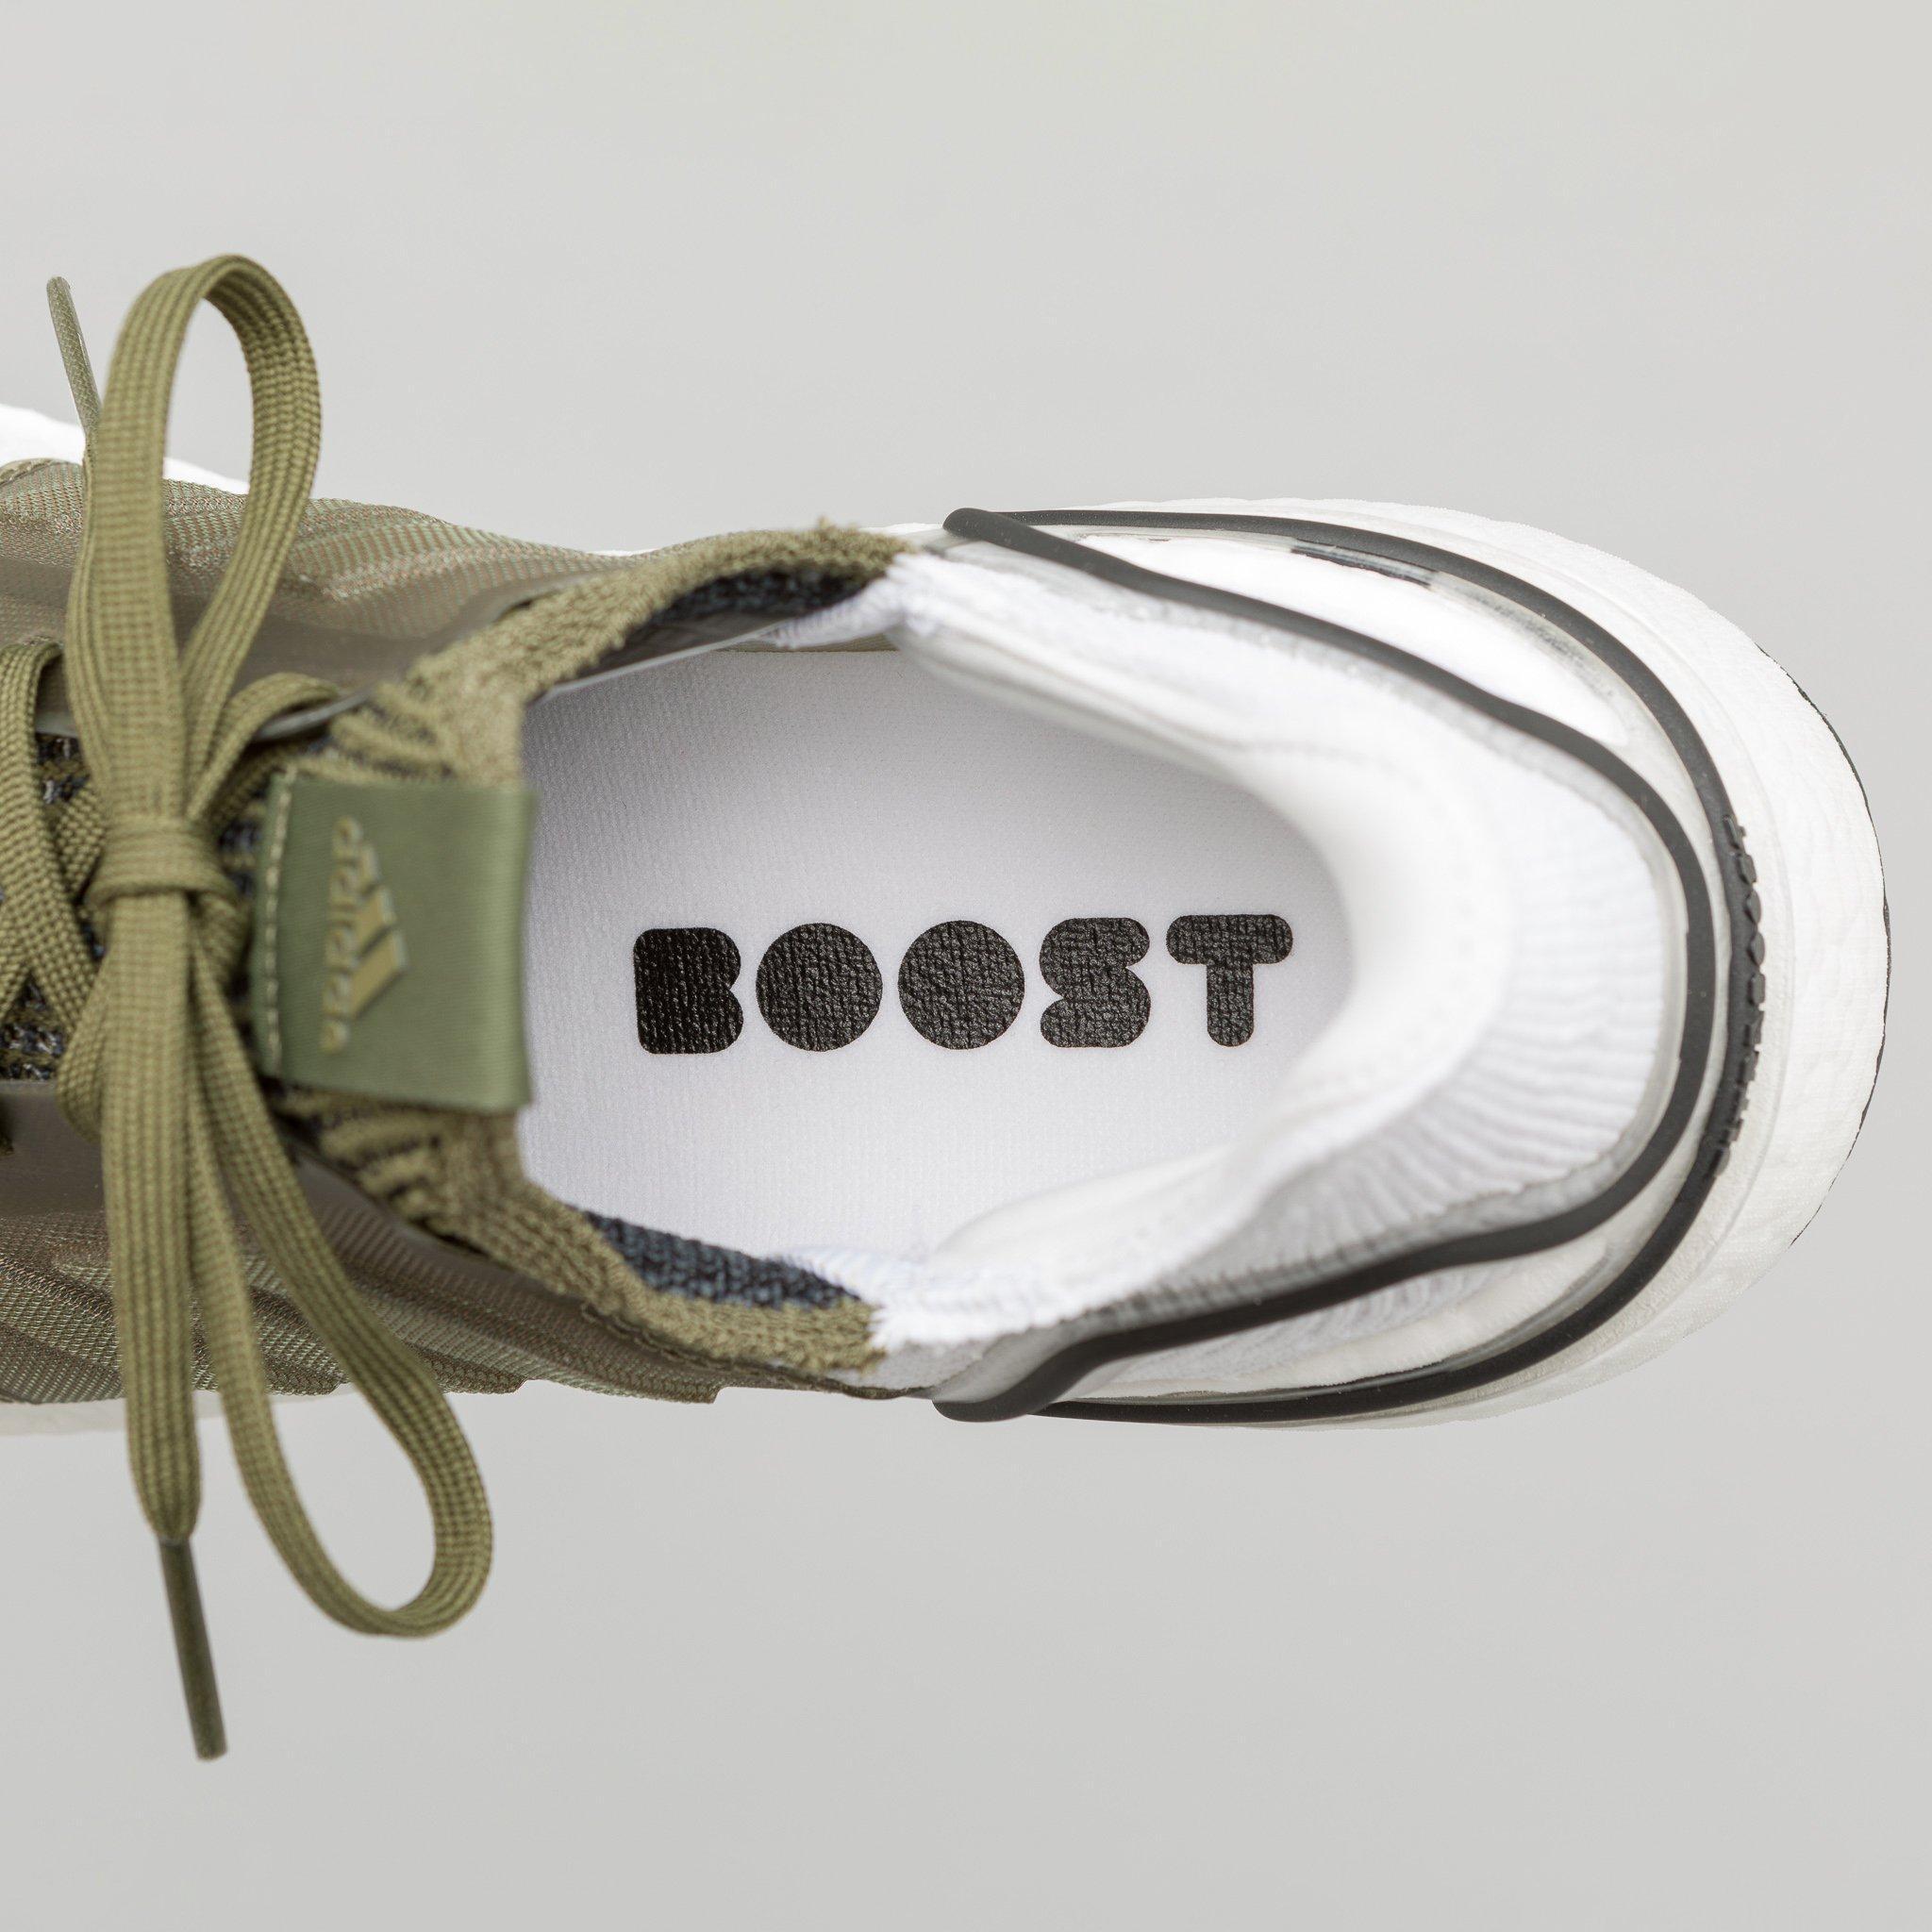 987d858273a82 Adidas - Ultra Boost 19 In Khaki white for Men - Lyst. View fullscreen